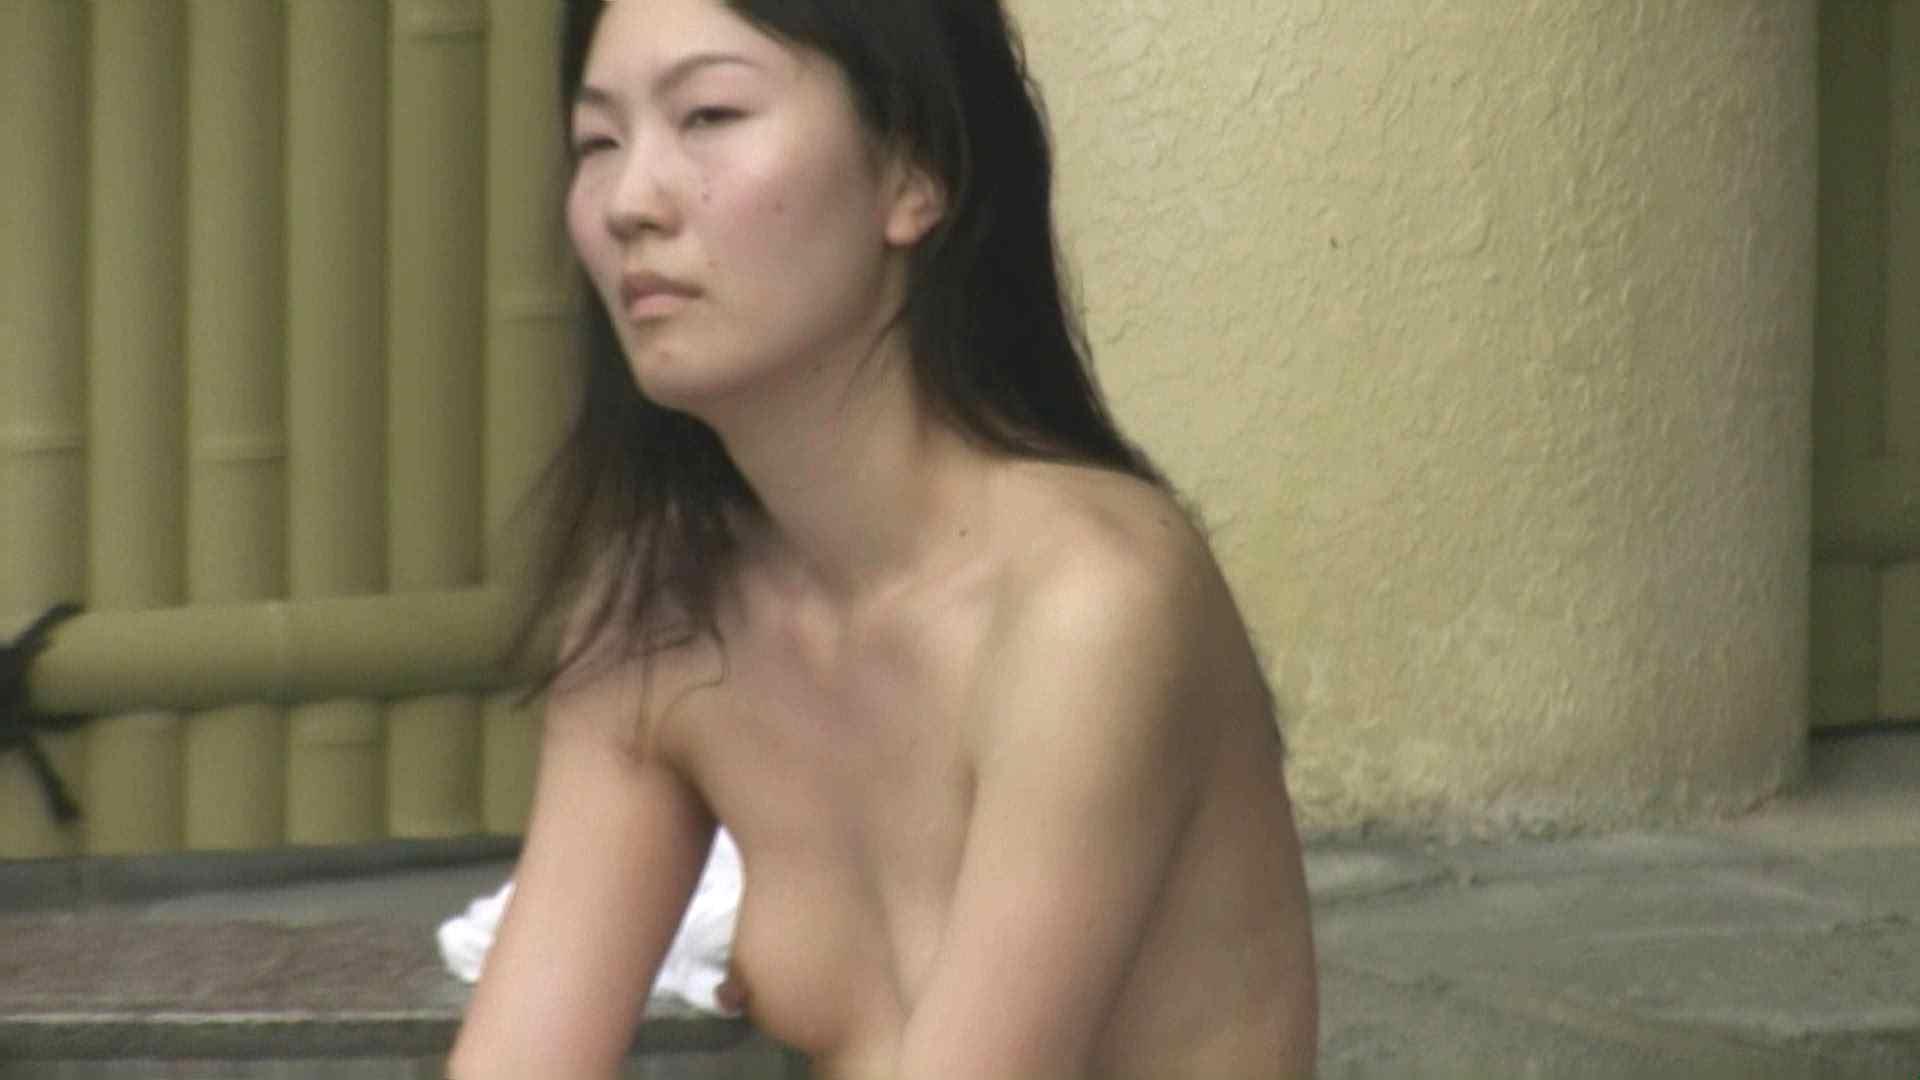 高画質露天女風呂観察 vol.034 望遠映像 AV無料動画キャプチャ 103PIX 83